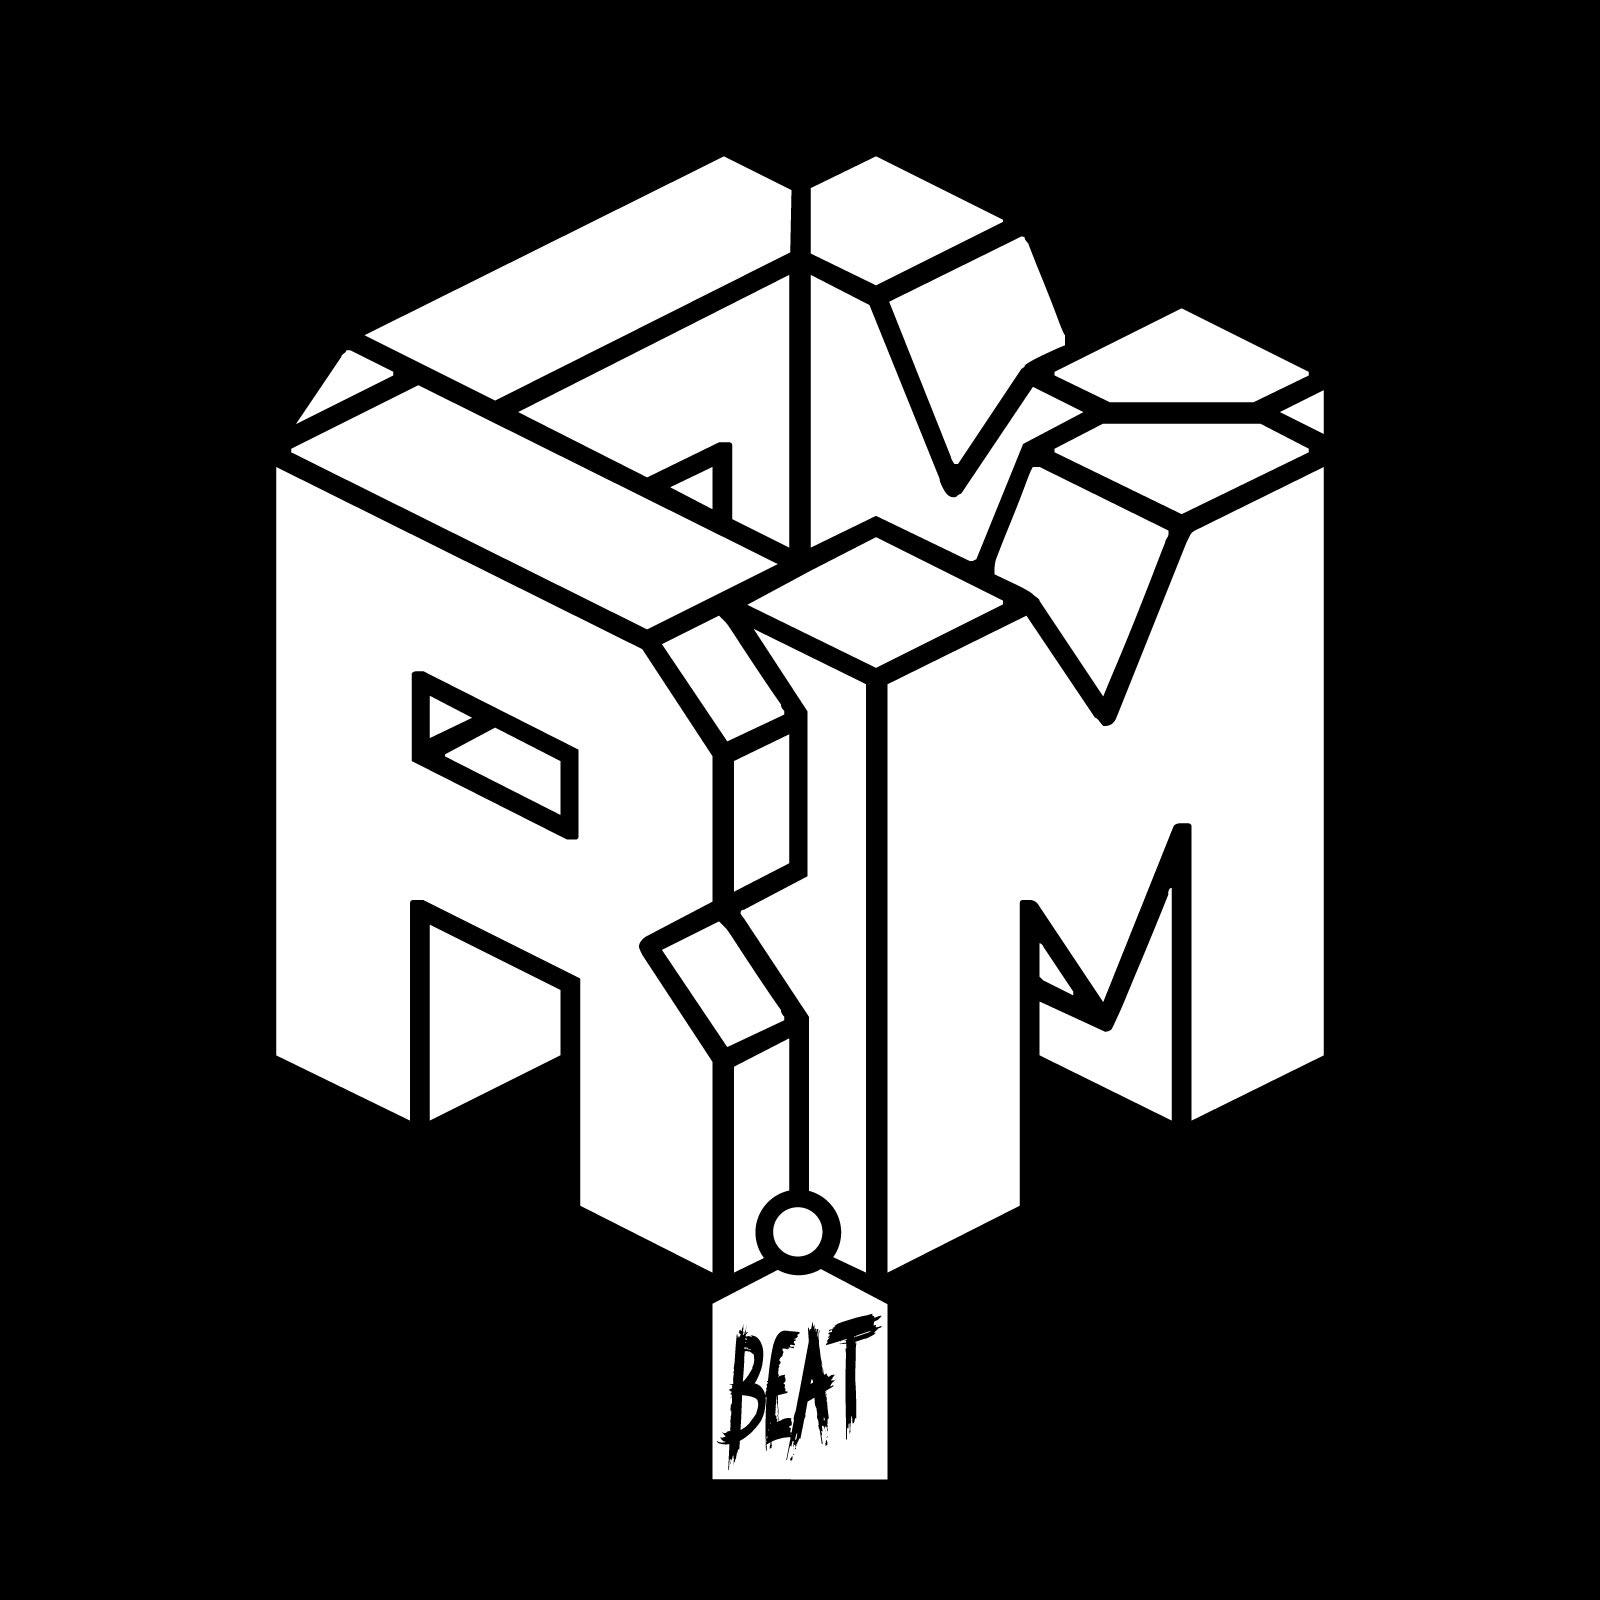 RM BEAT